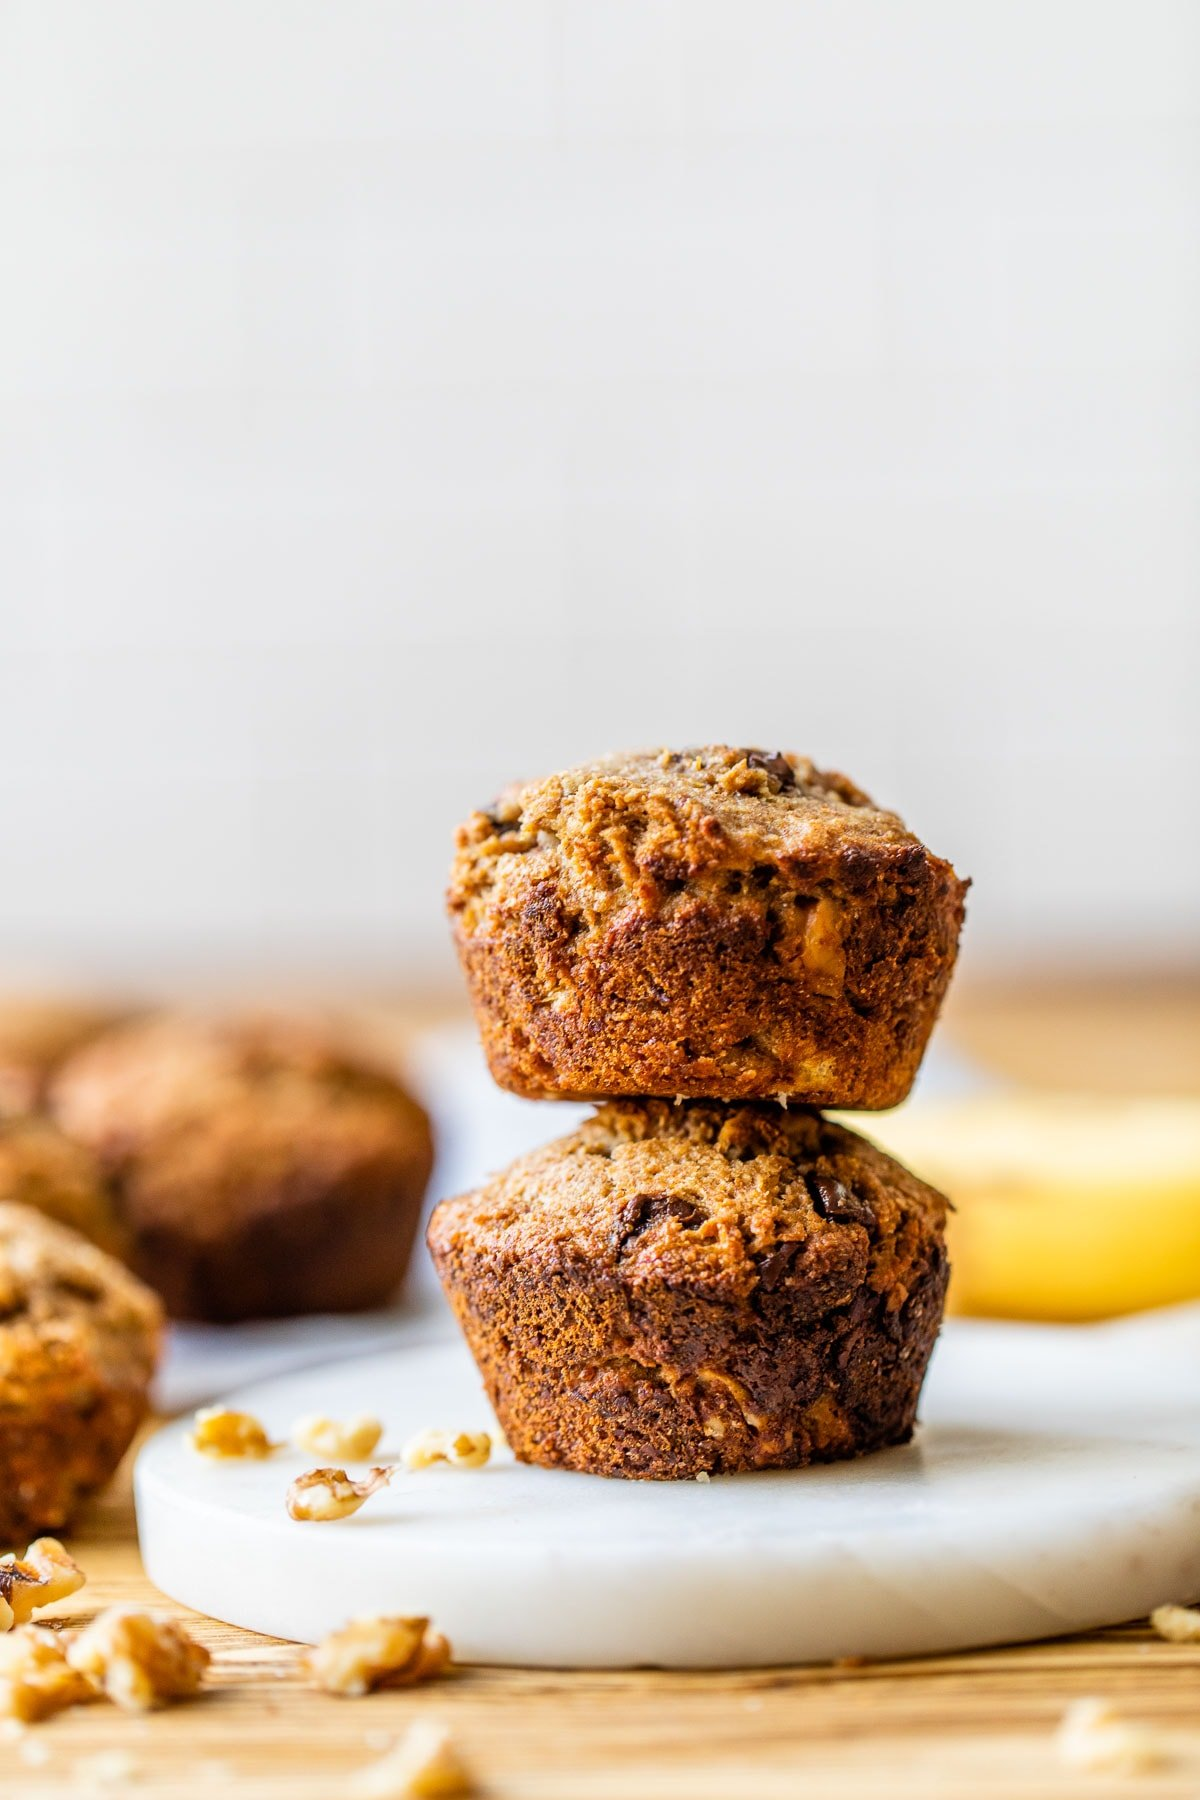 A stack of banana bran muffins